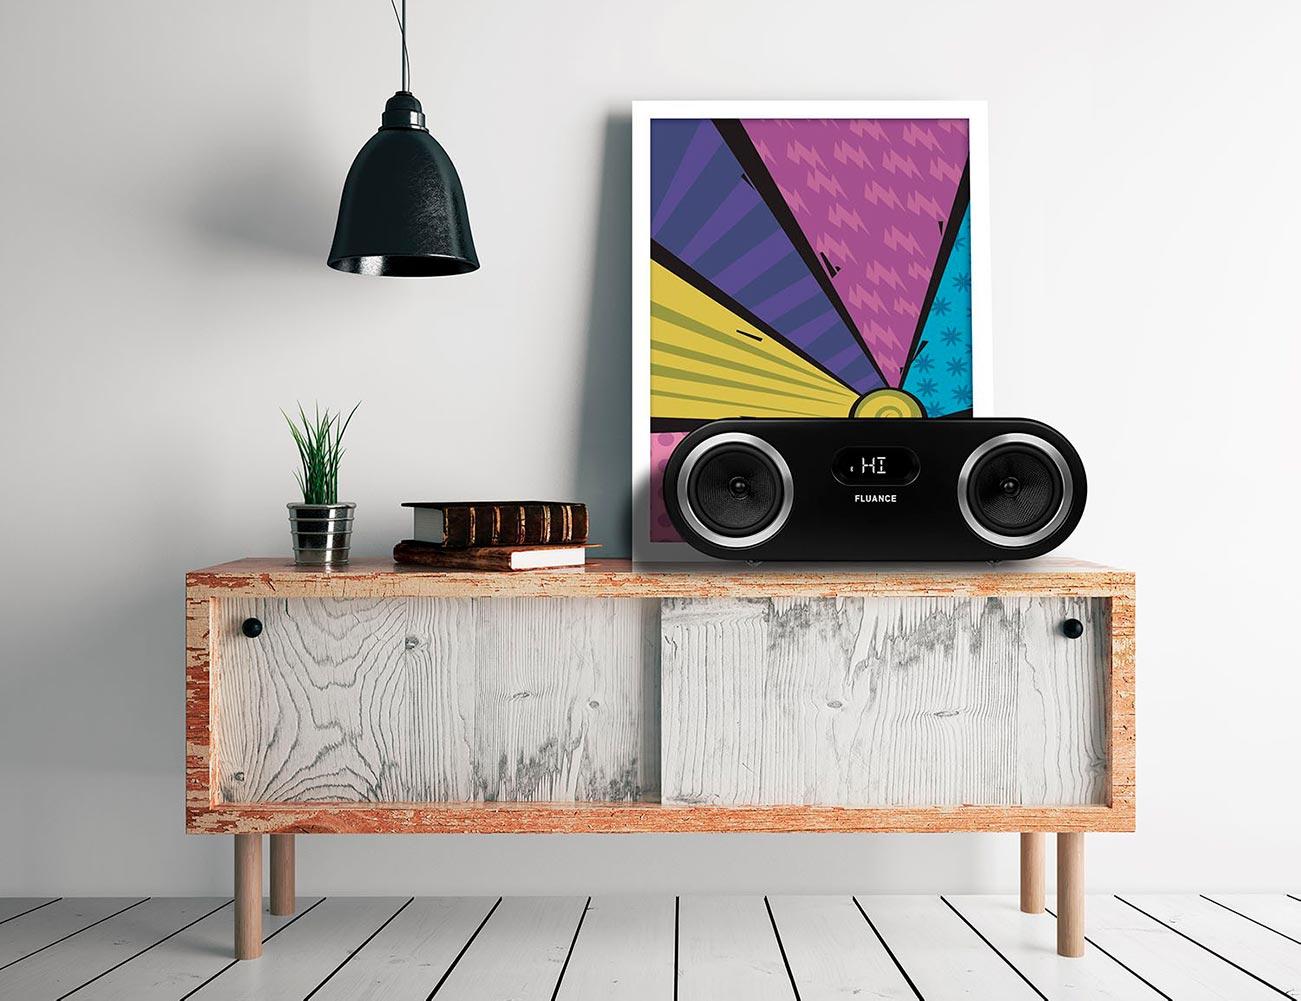 Fluance Fi50 High Performance Bluetooth Wood Speaker System